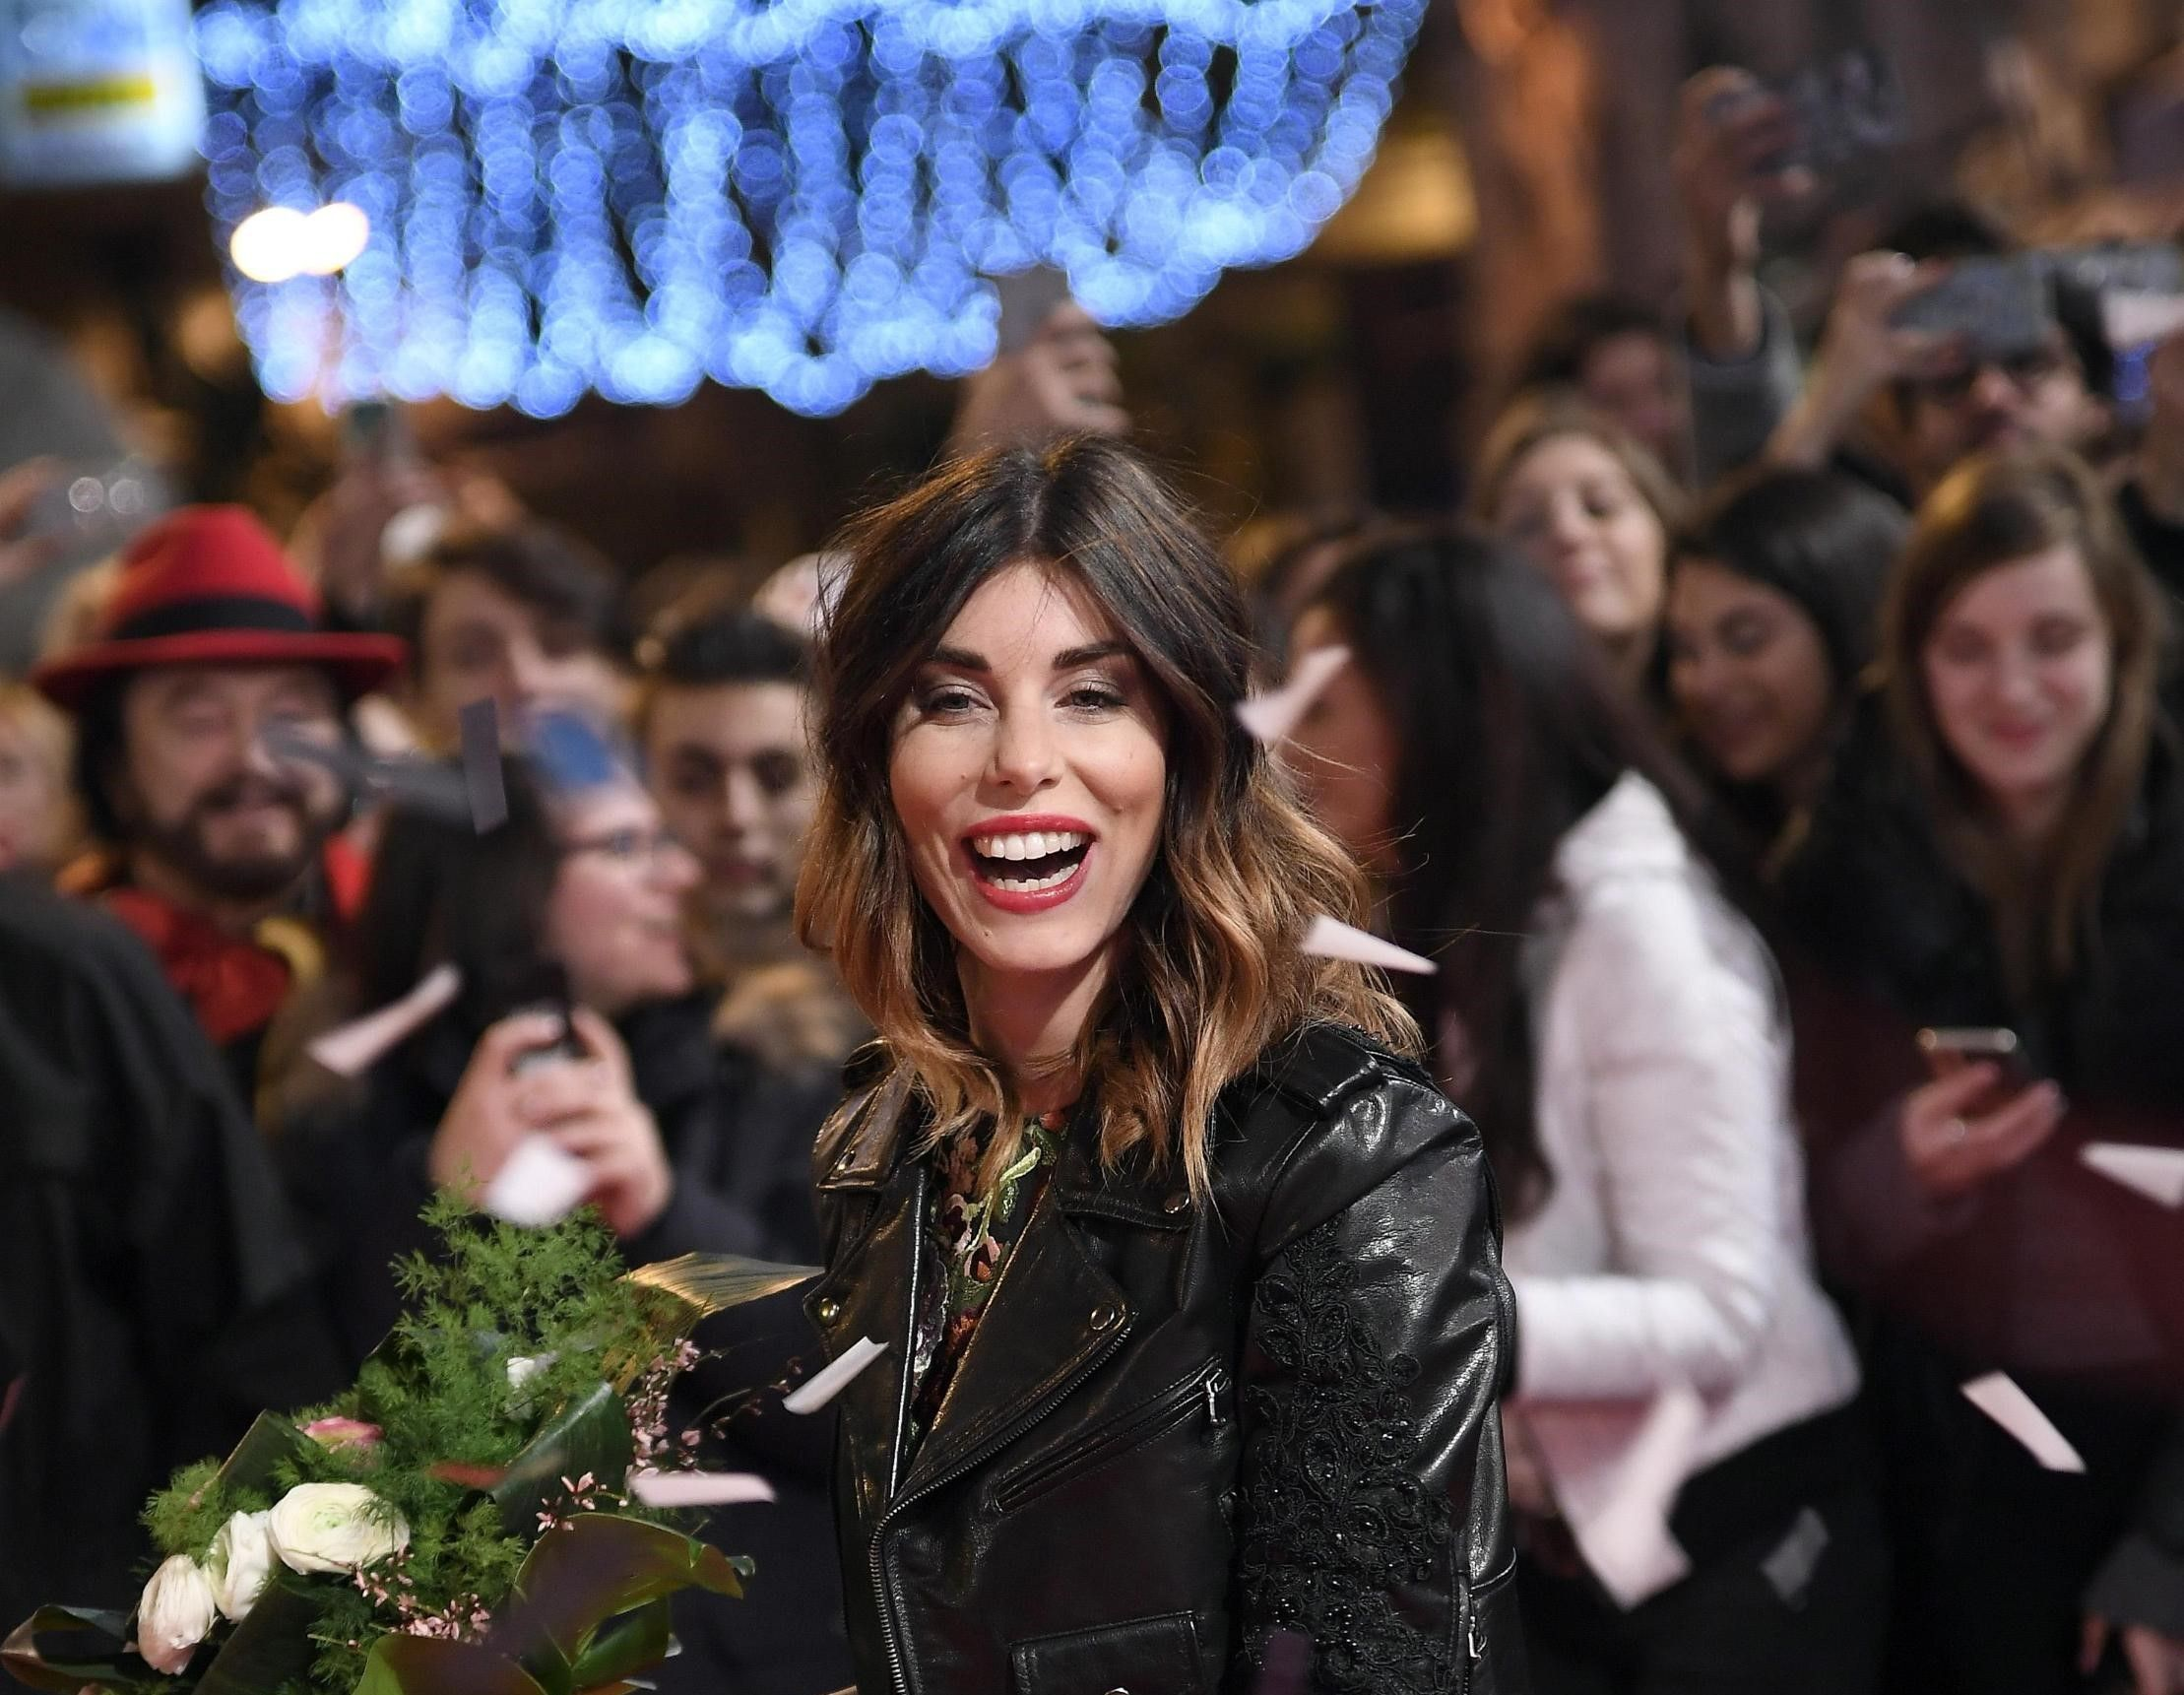 Bianca Atzei, nessun flirt con Jonathan Kashanian: 'Sono felicemente single'